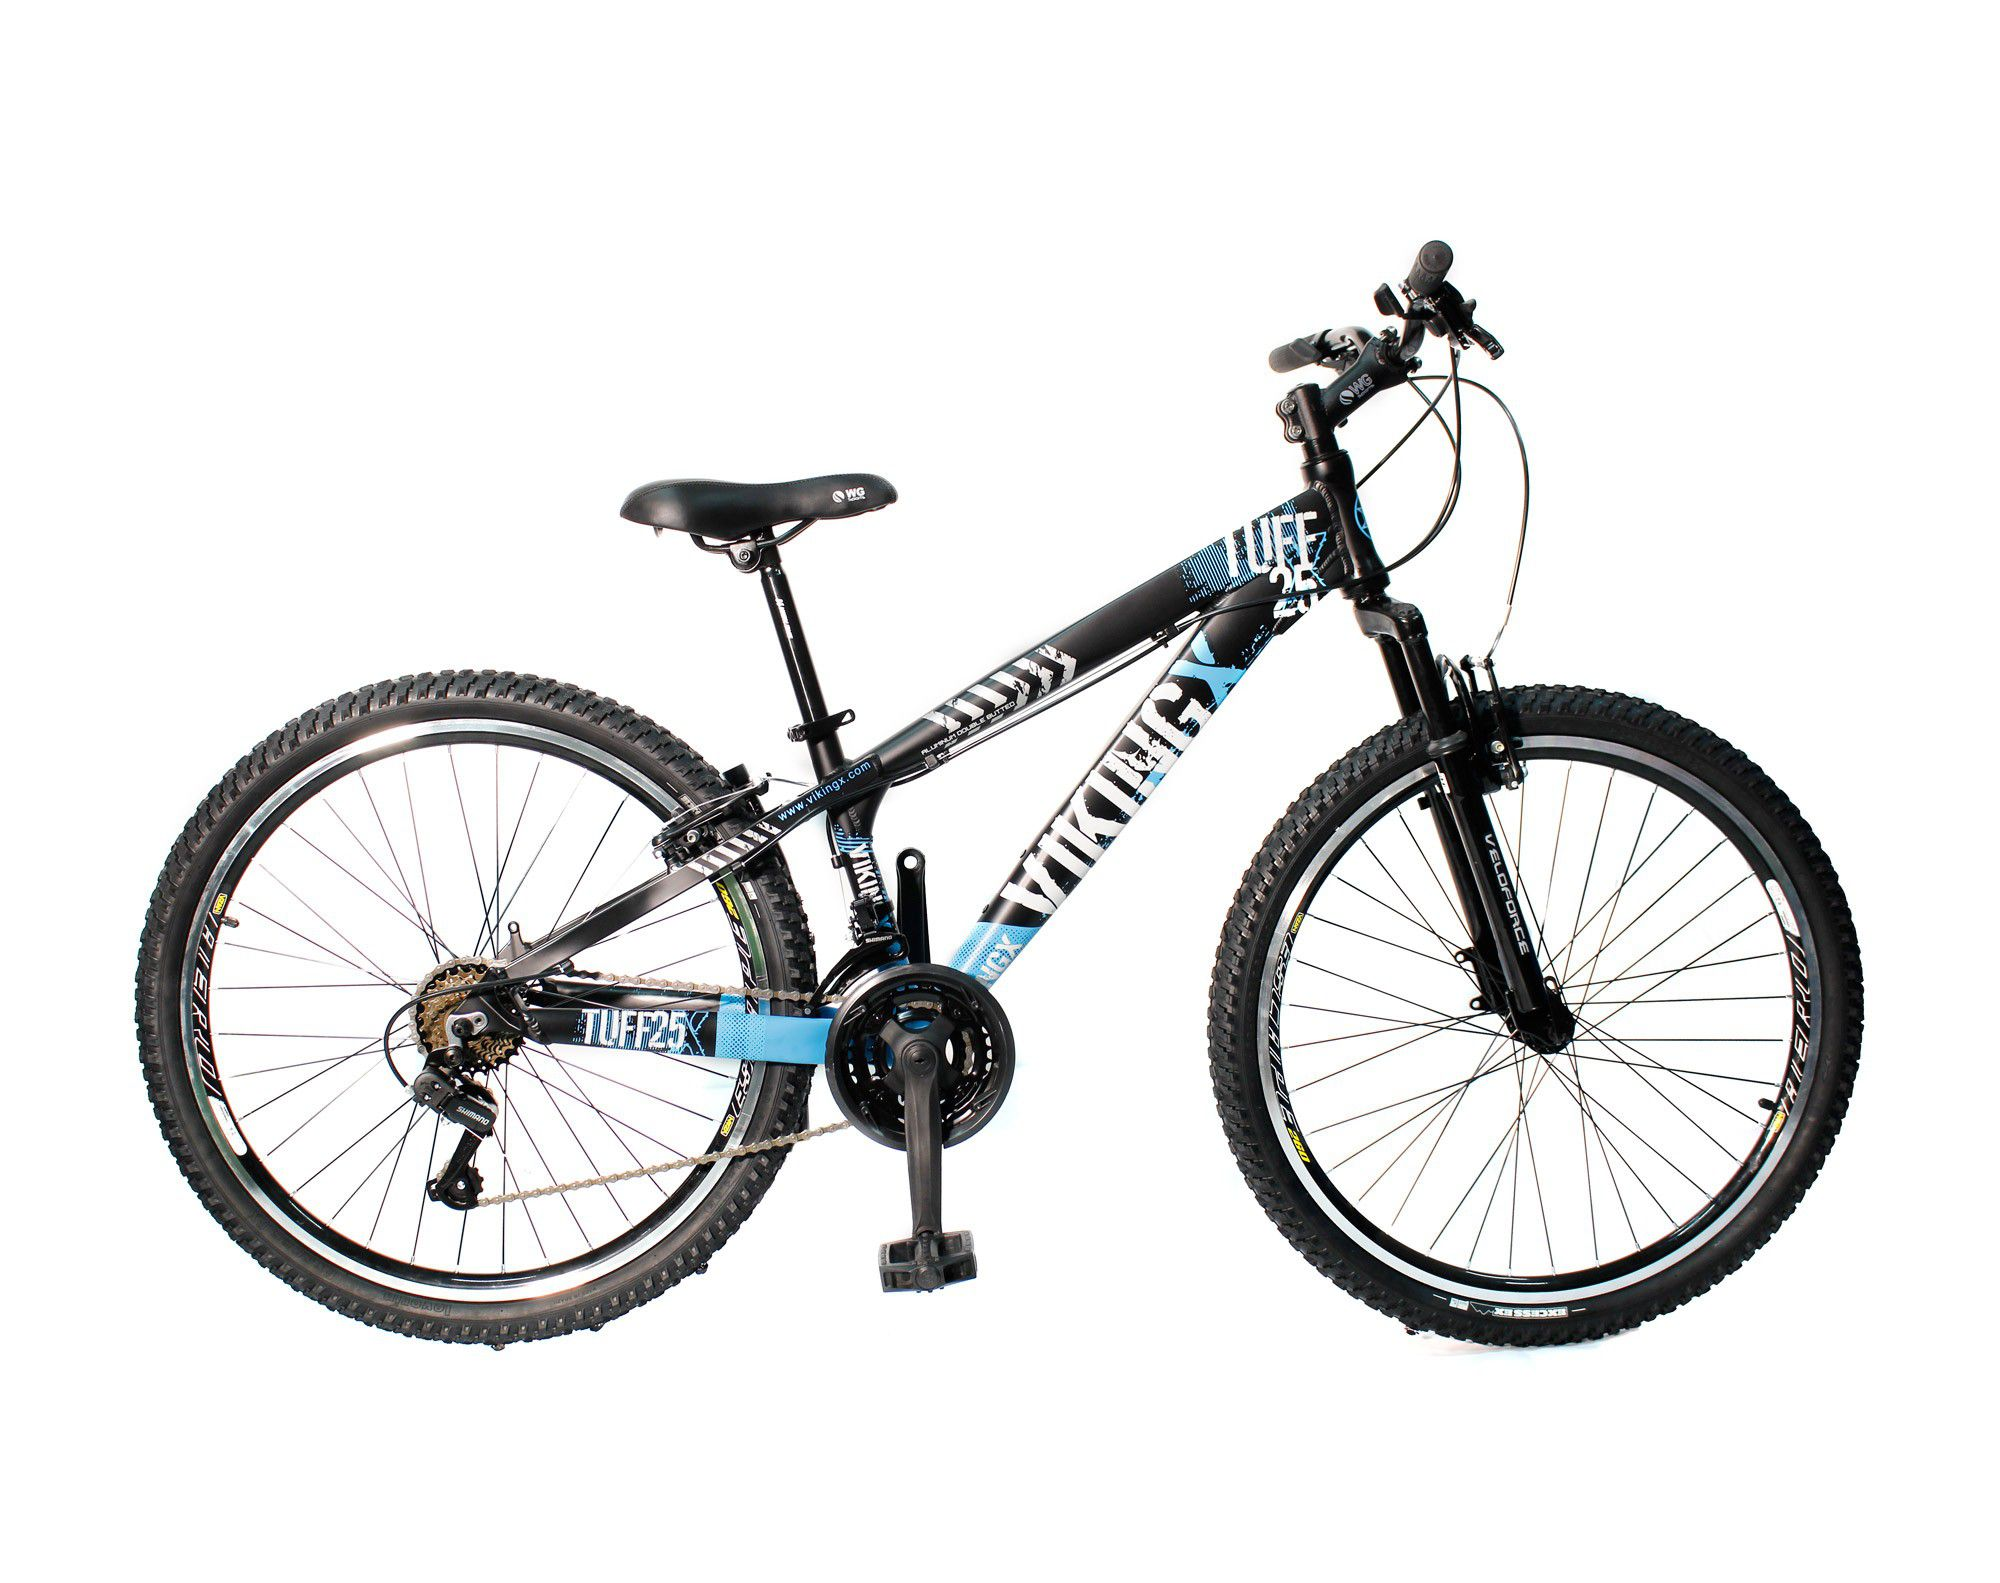 Bicicleta Vikingx Tuff Freeride Freio V-brake Preto/Azul